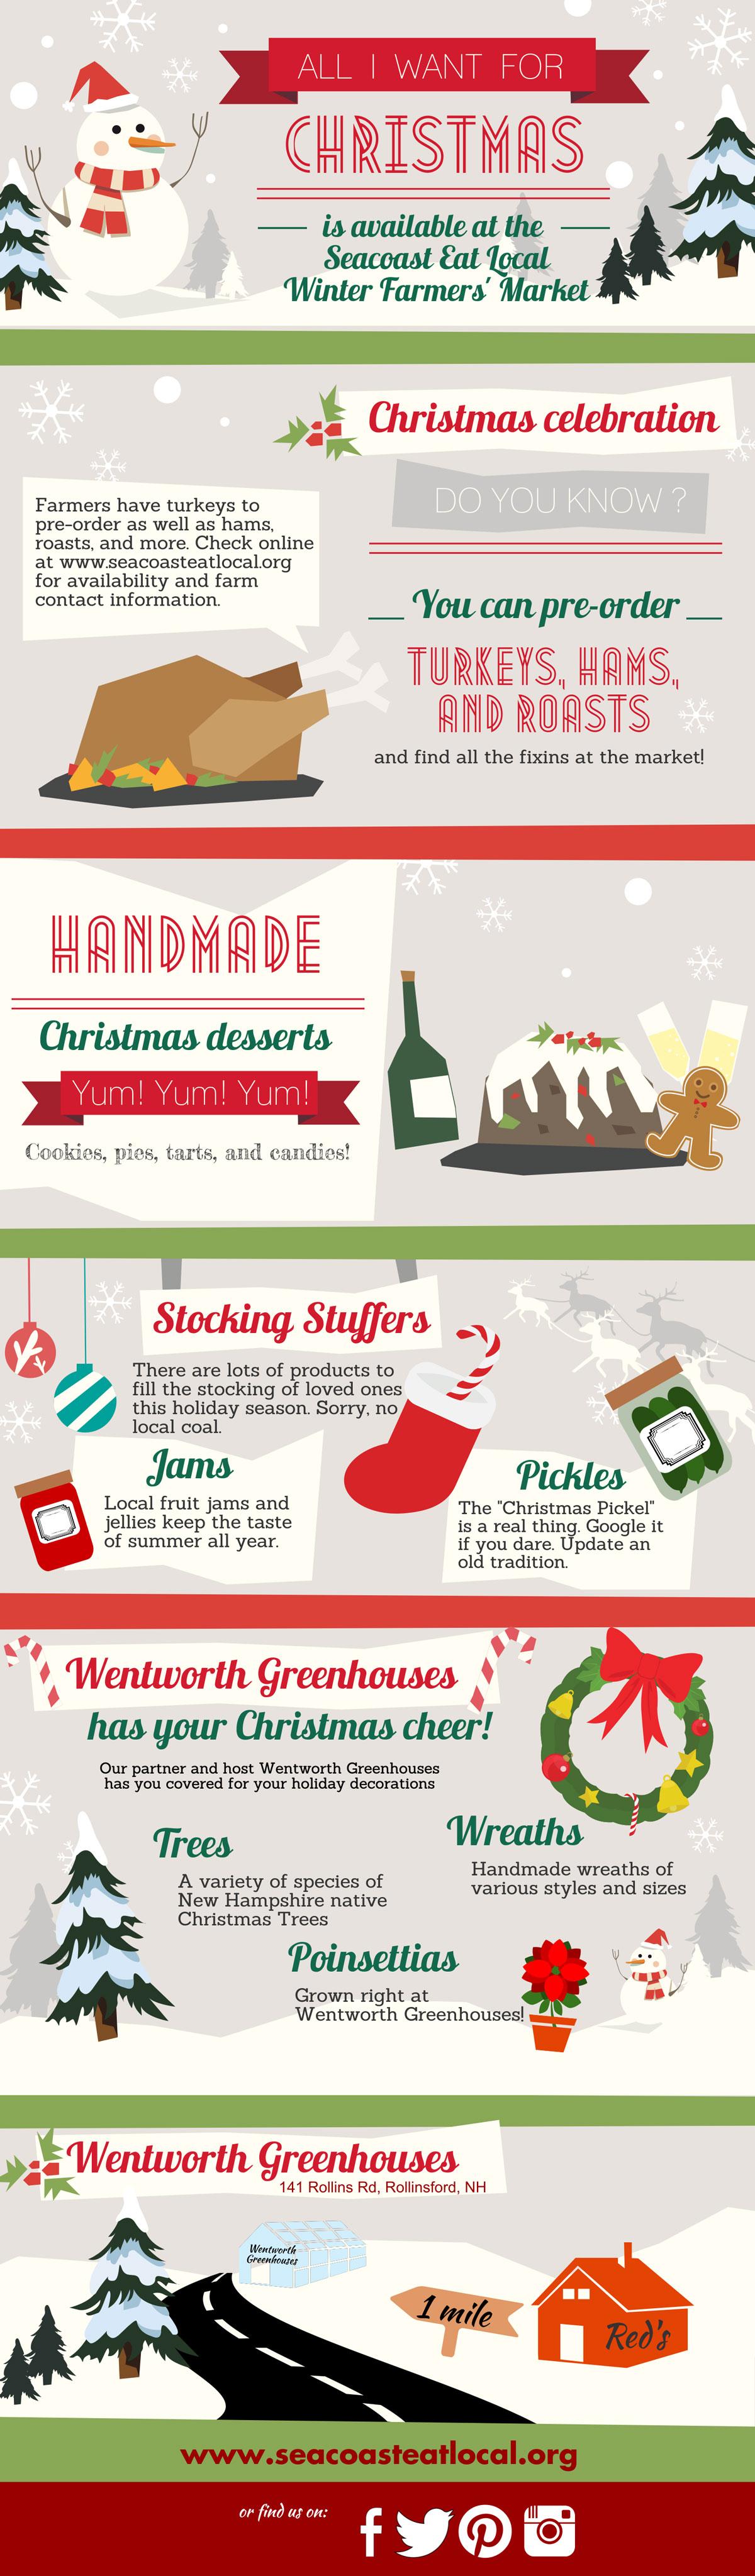 christmast-market